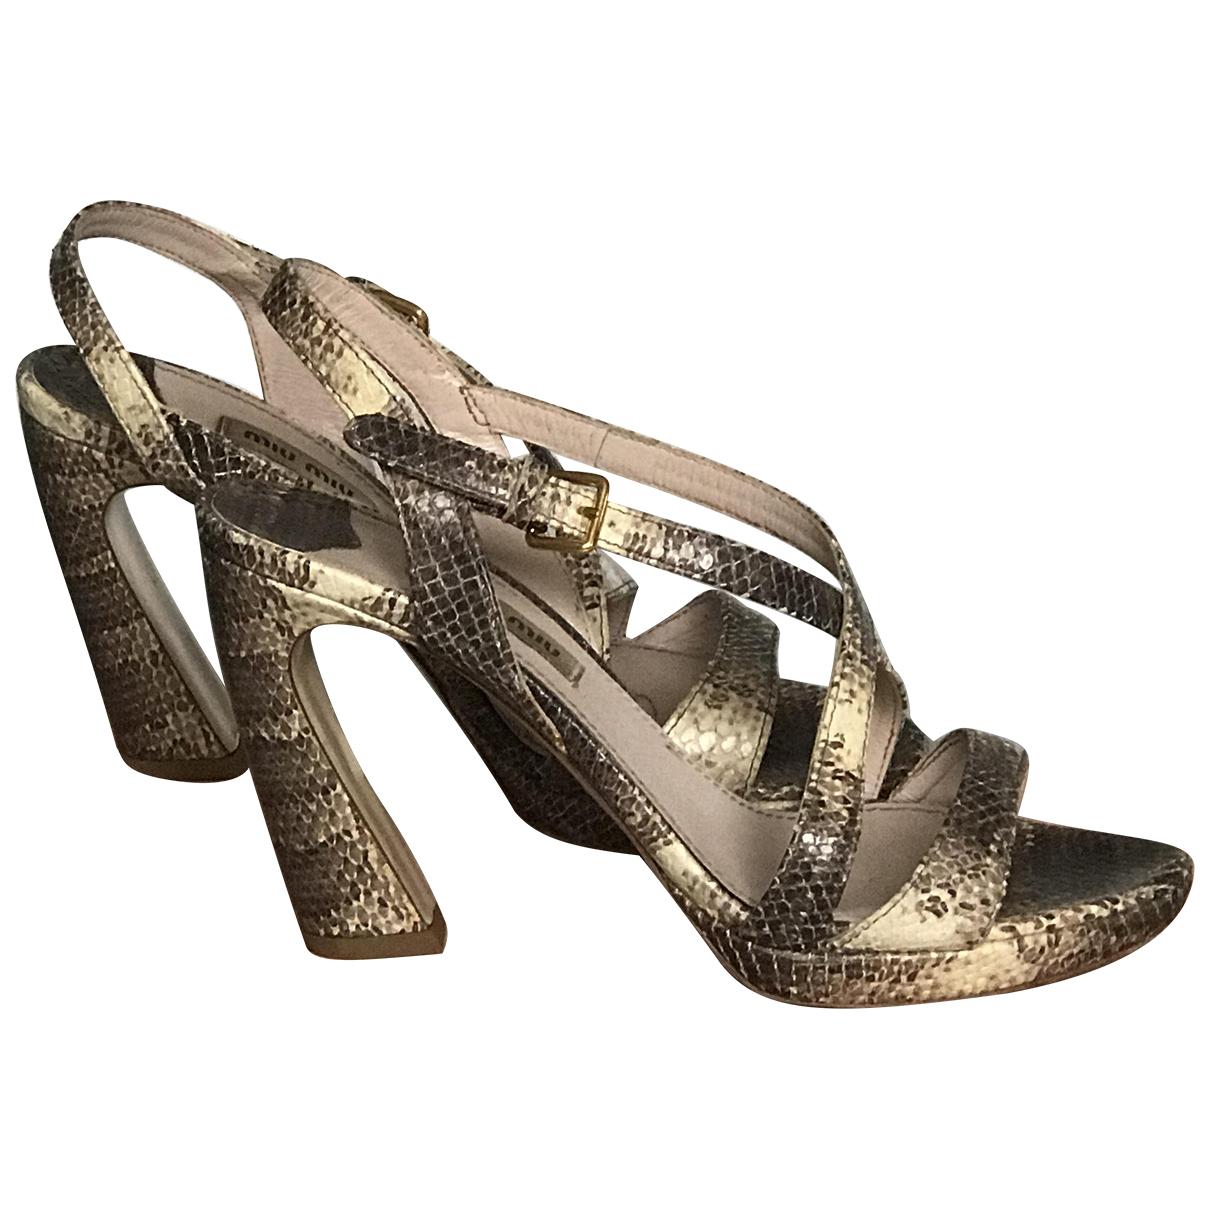 Miu Miu \N Gold Leather Sandals for Women 37 IT